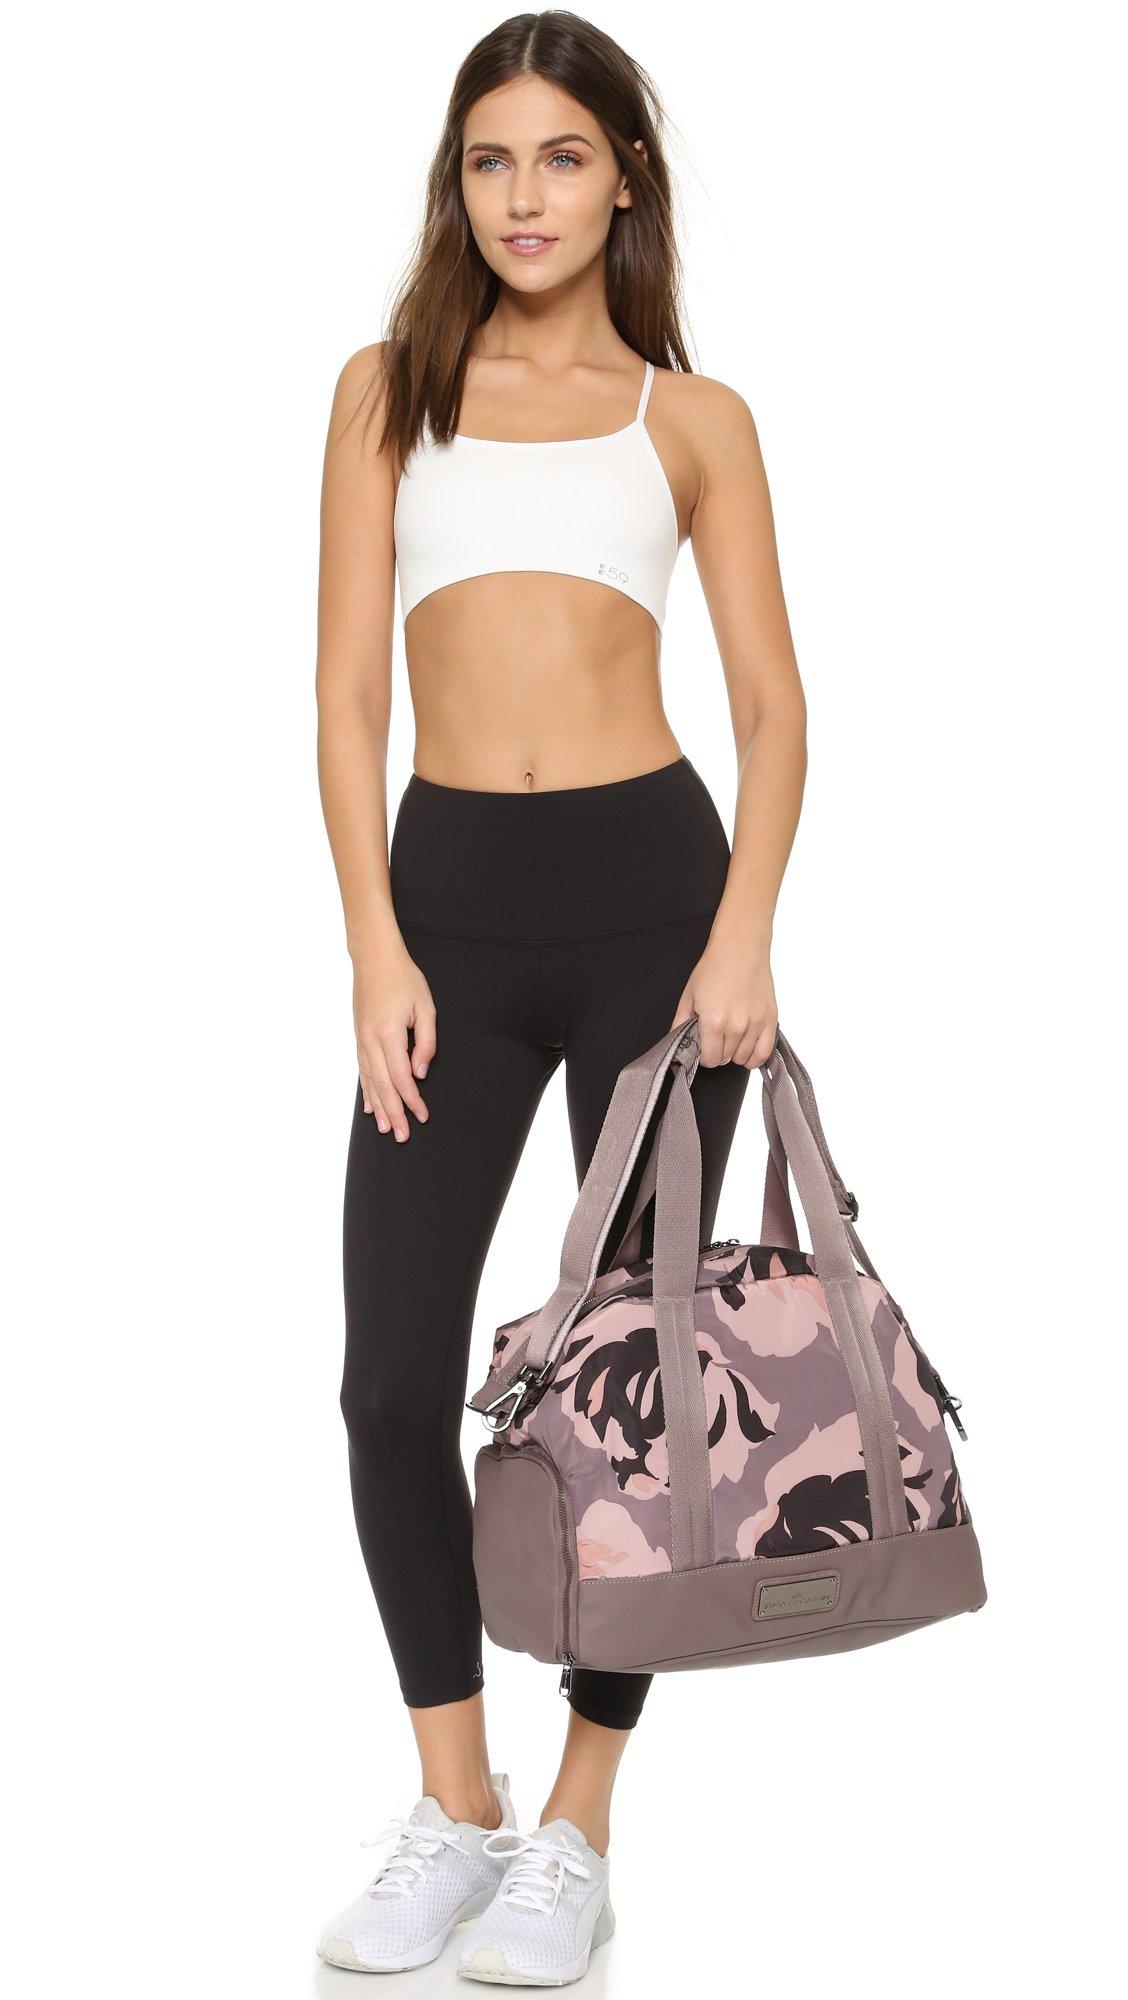 5e8ac836c9e1 Lyst - adidas By Stella McCartney Small Gym Bag - Cement Grey smoke Pink